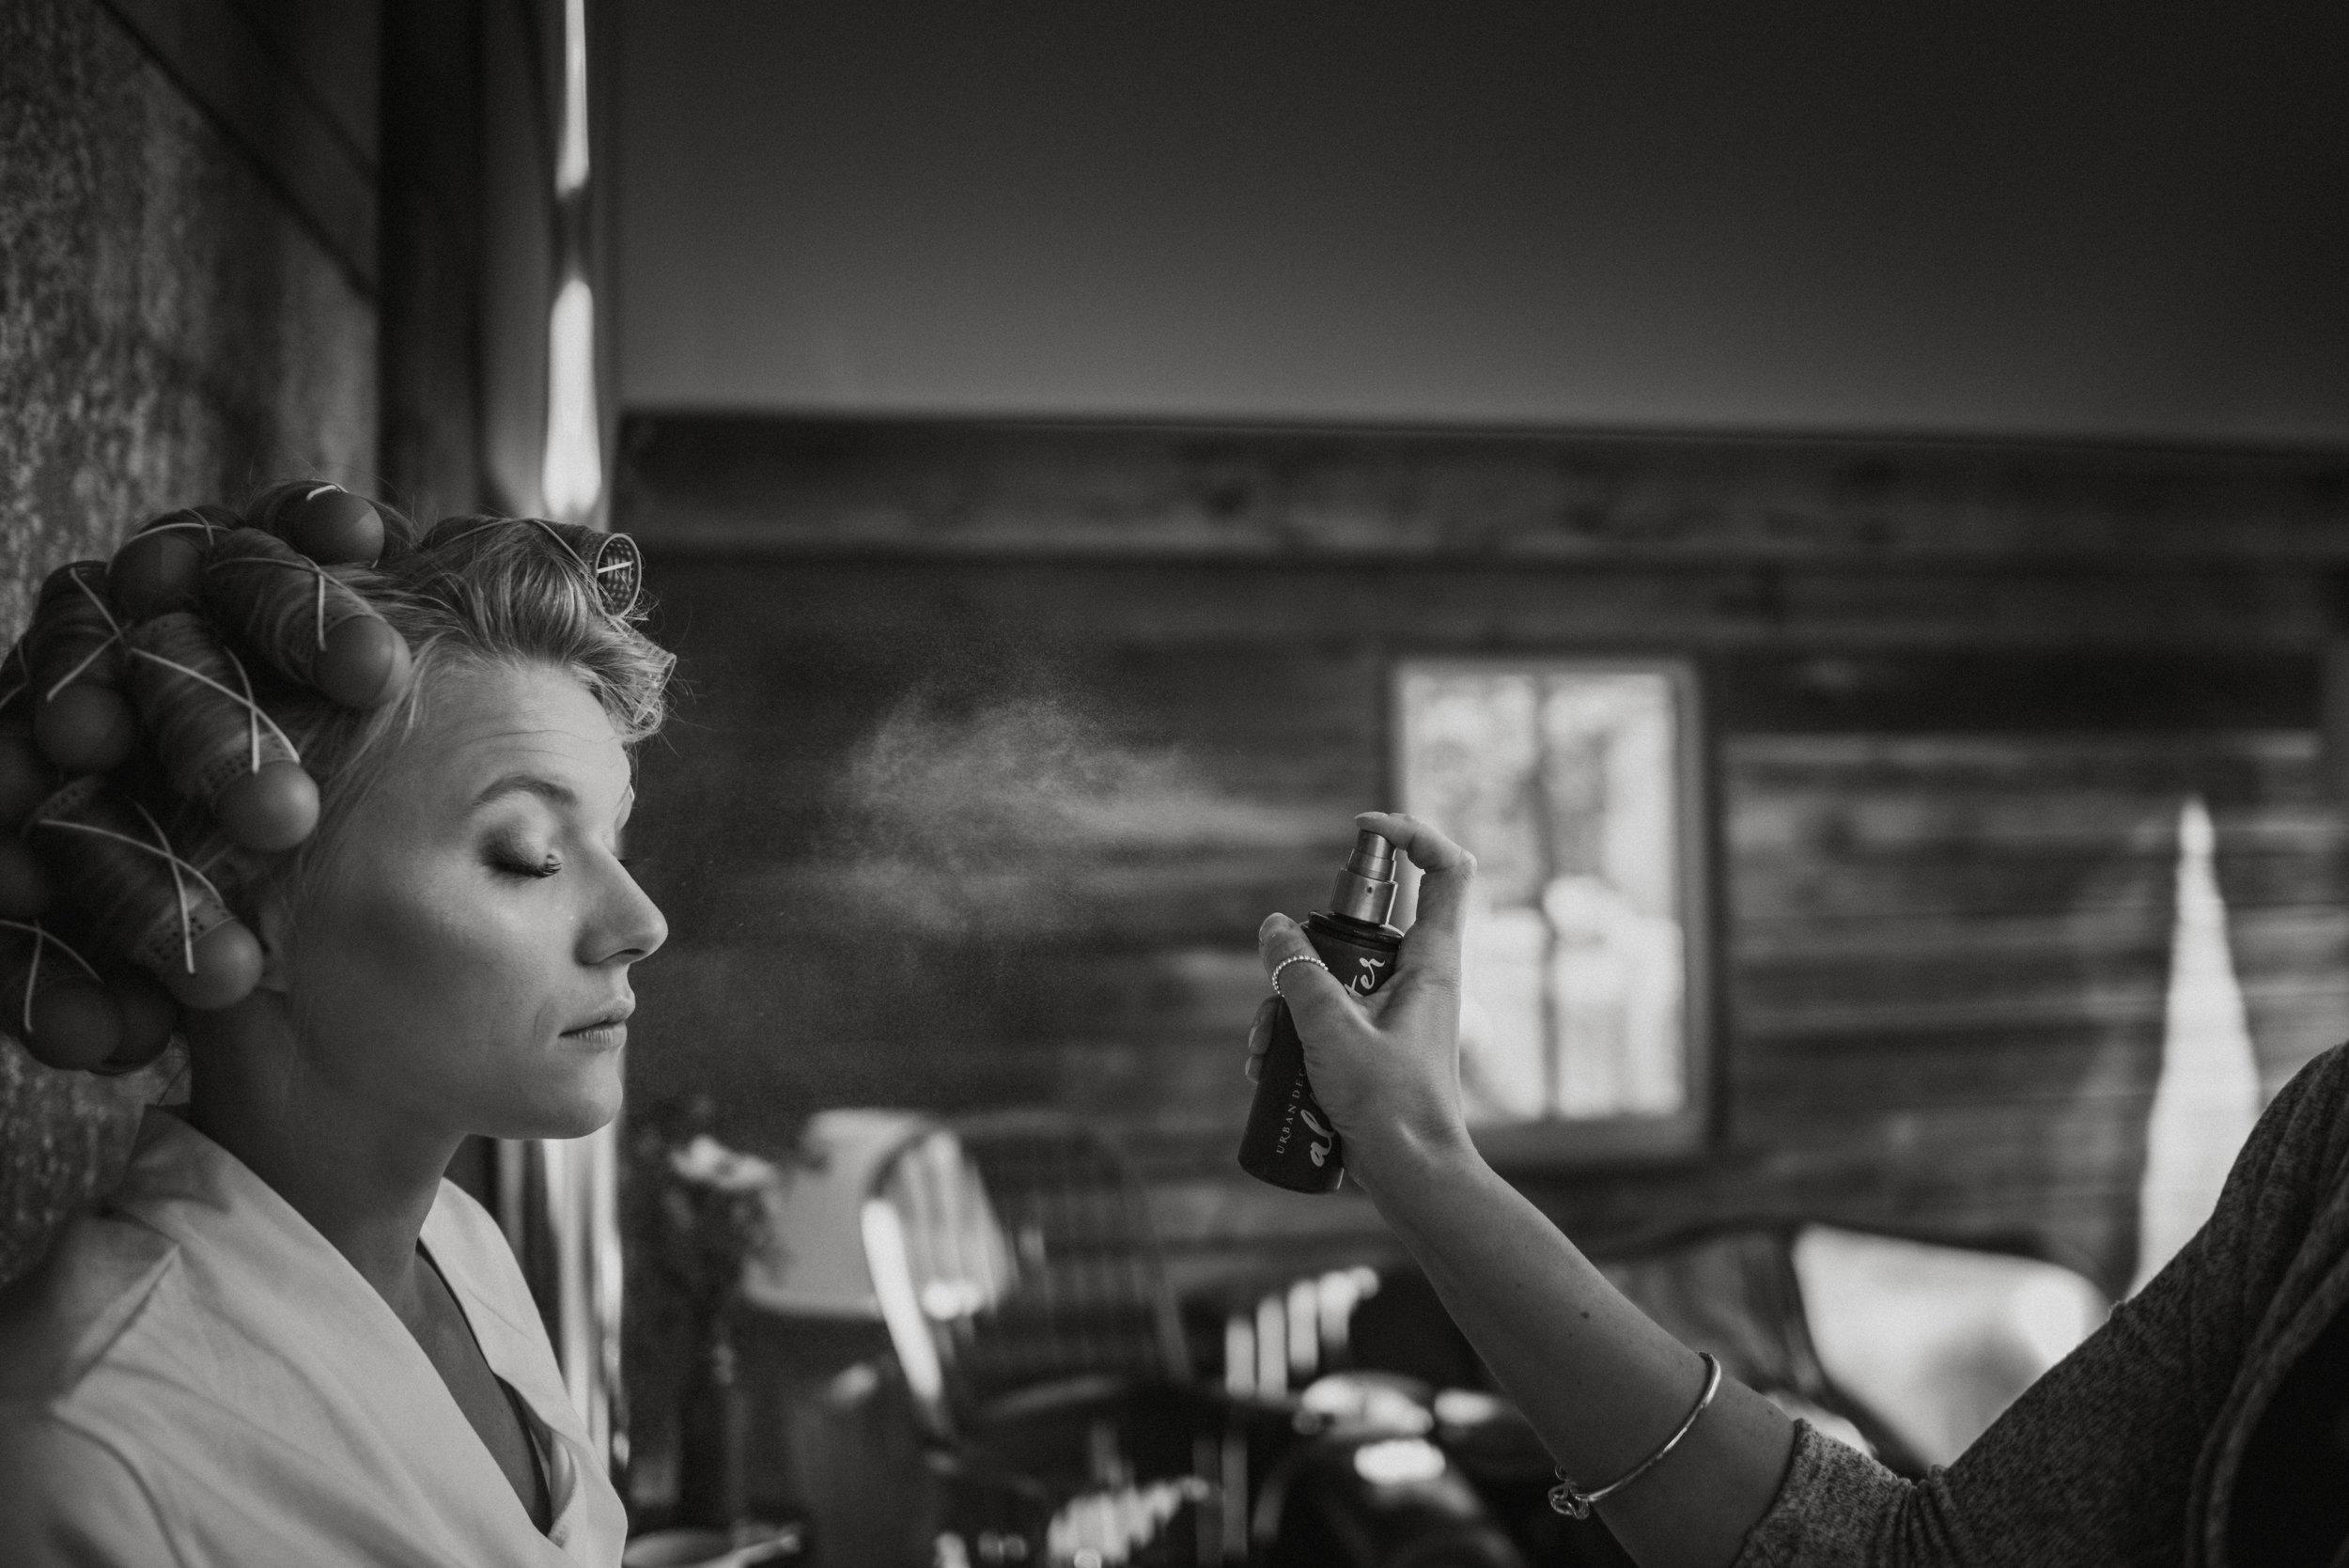 Mark-Shaw-Photography-Best2018-2.jpg